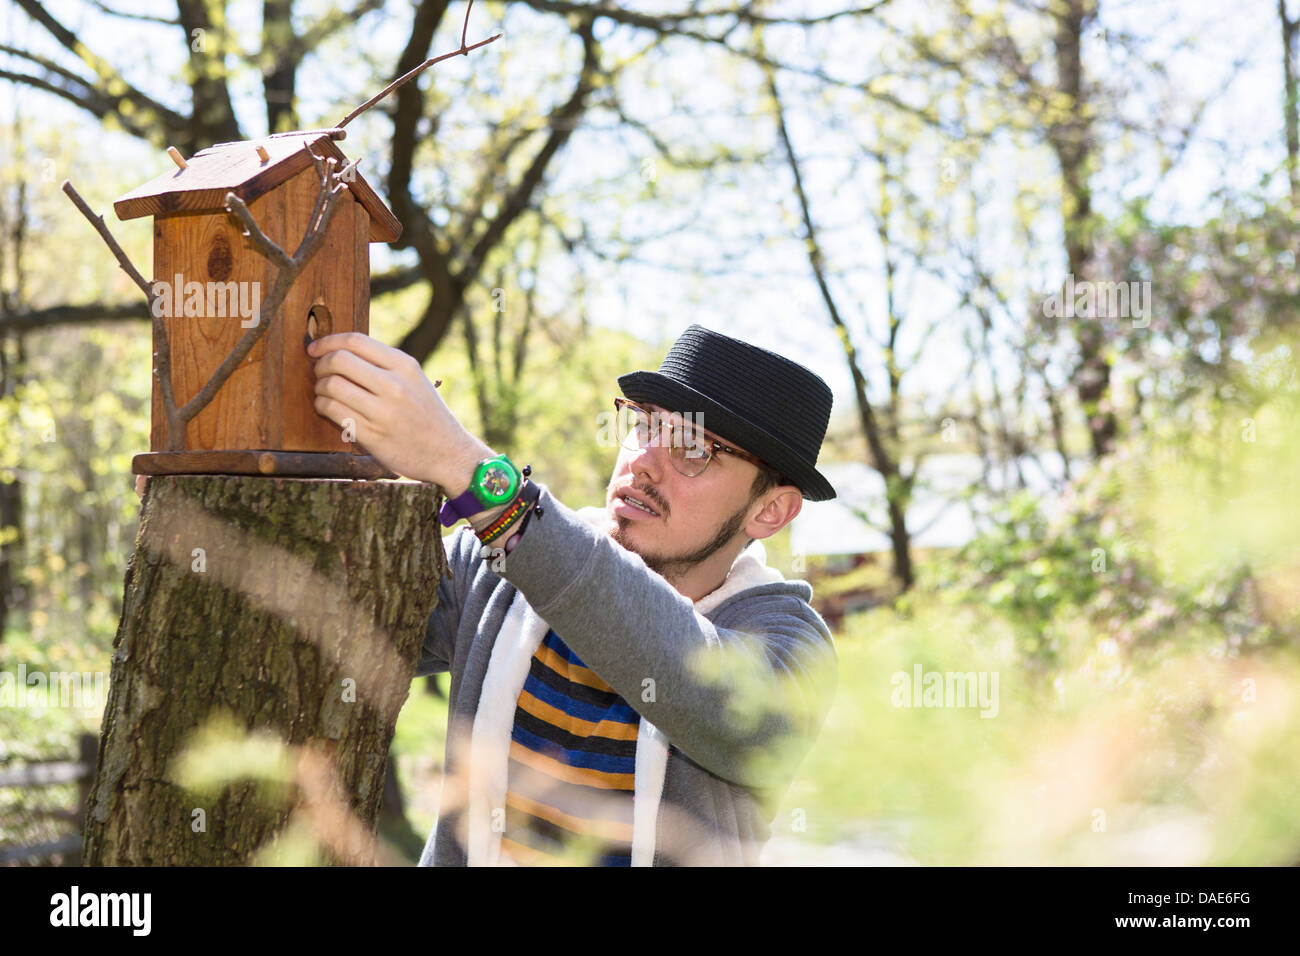 Man looking at bird house - Stock Image